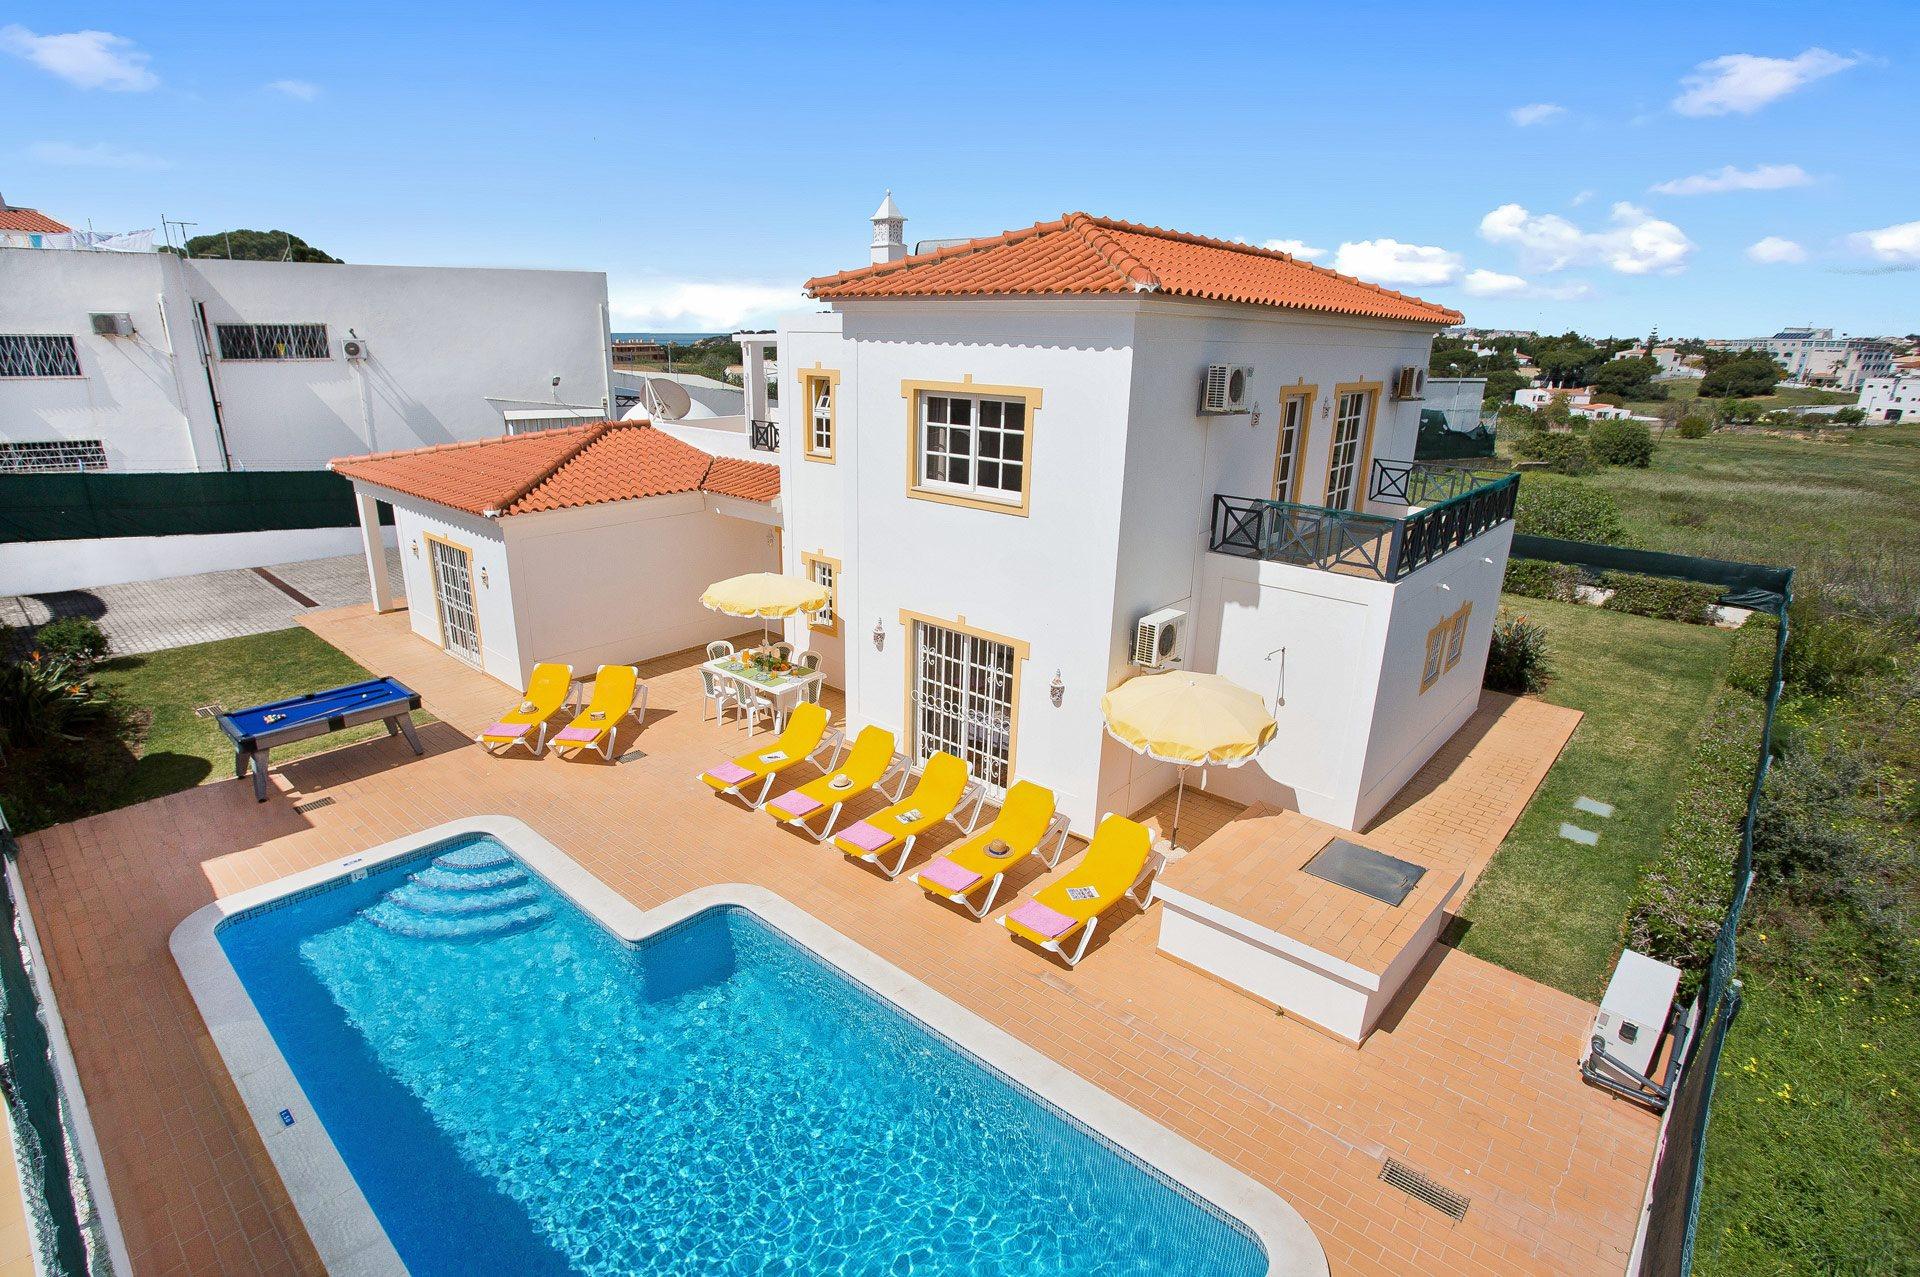 Villa Pacheco, Olhos D'Agua, Algarve, Portugal